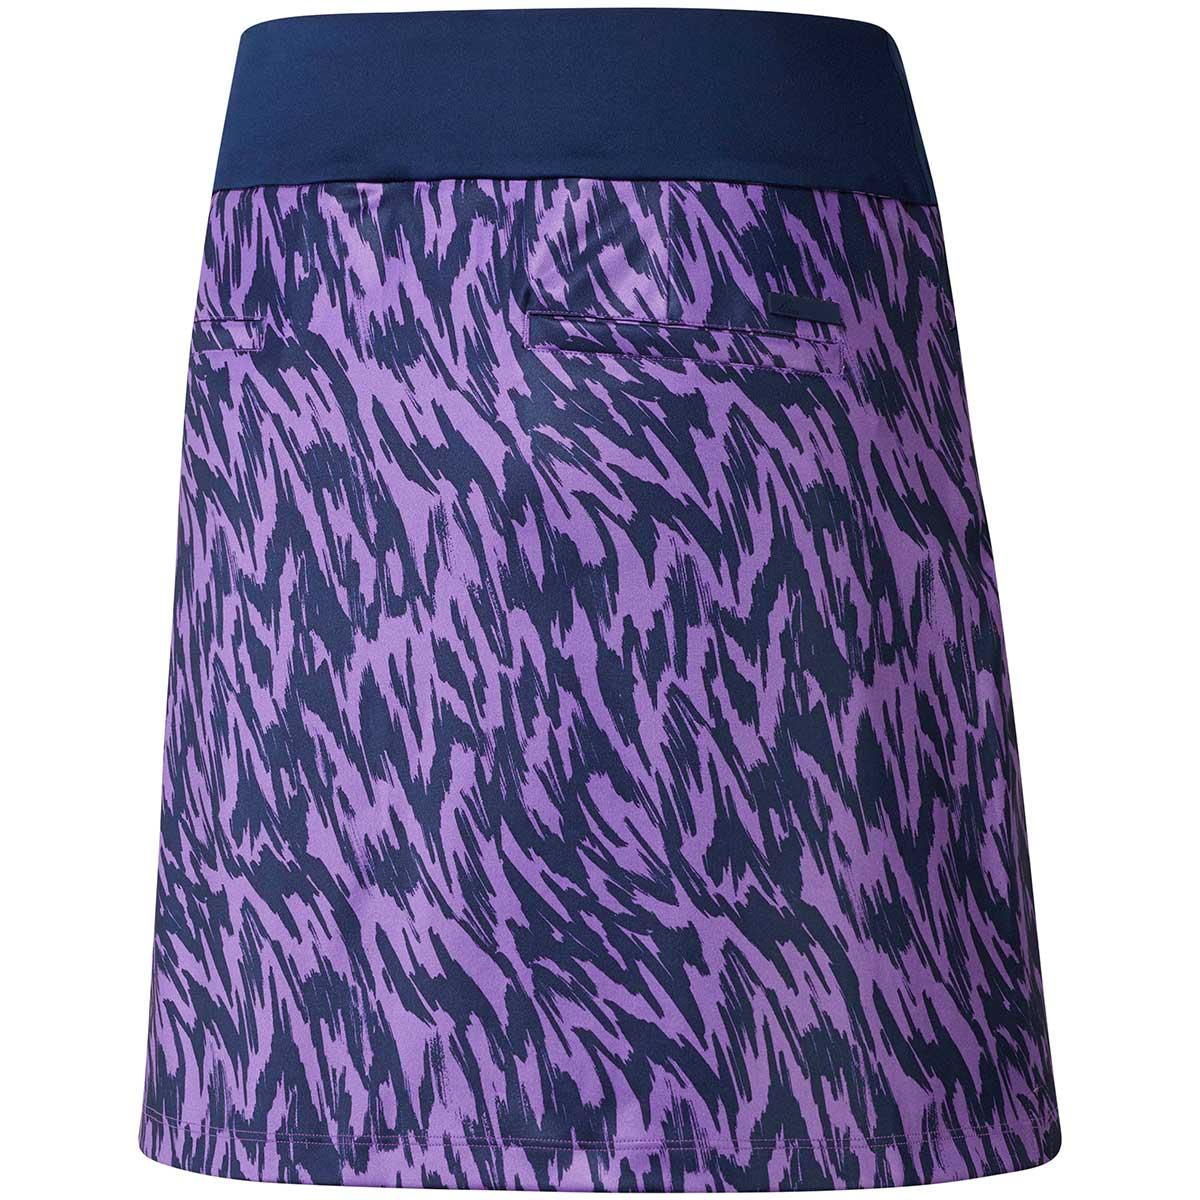 Adidas Women's Ultimate Printed Active Purple Sport Skort